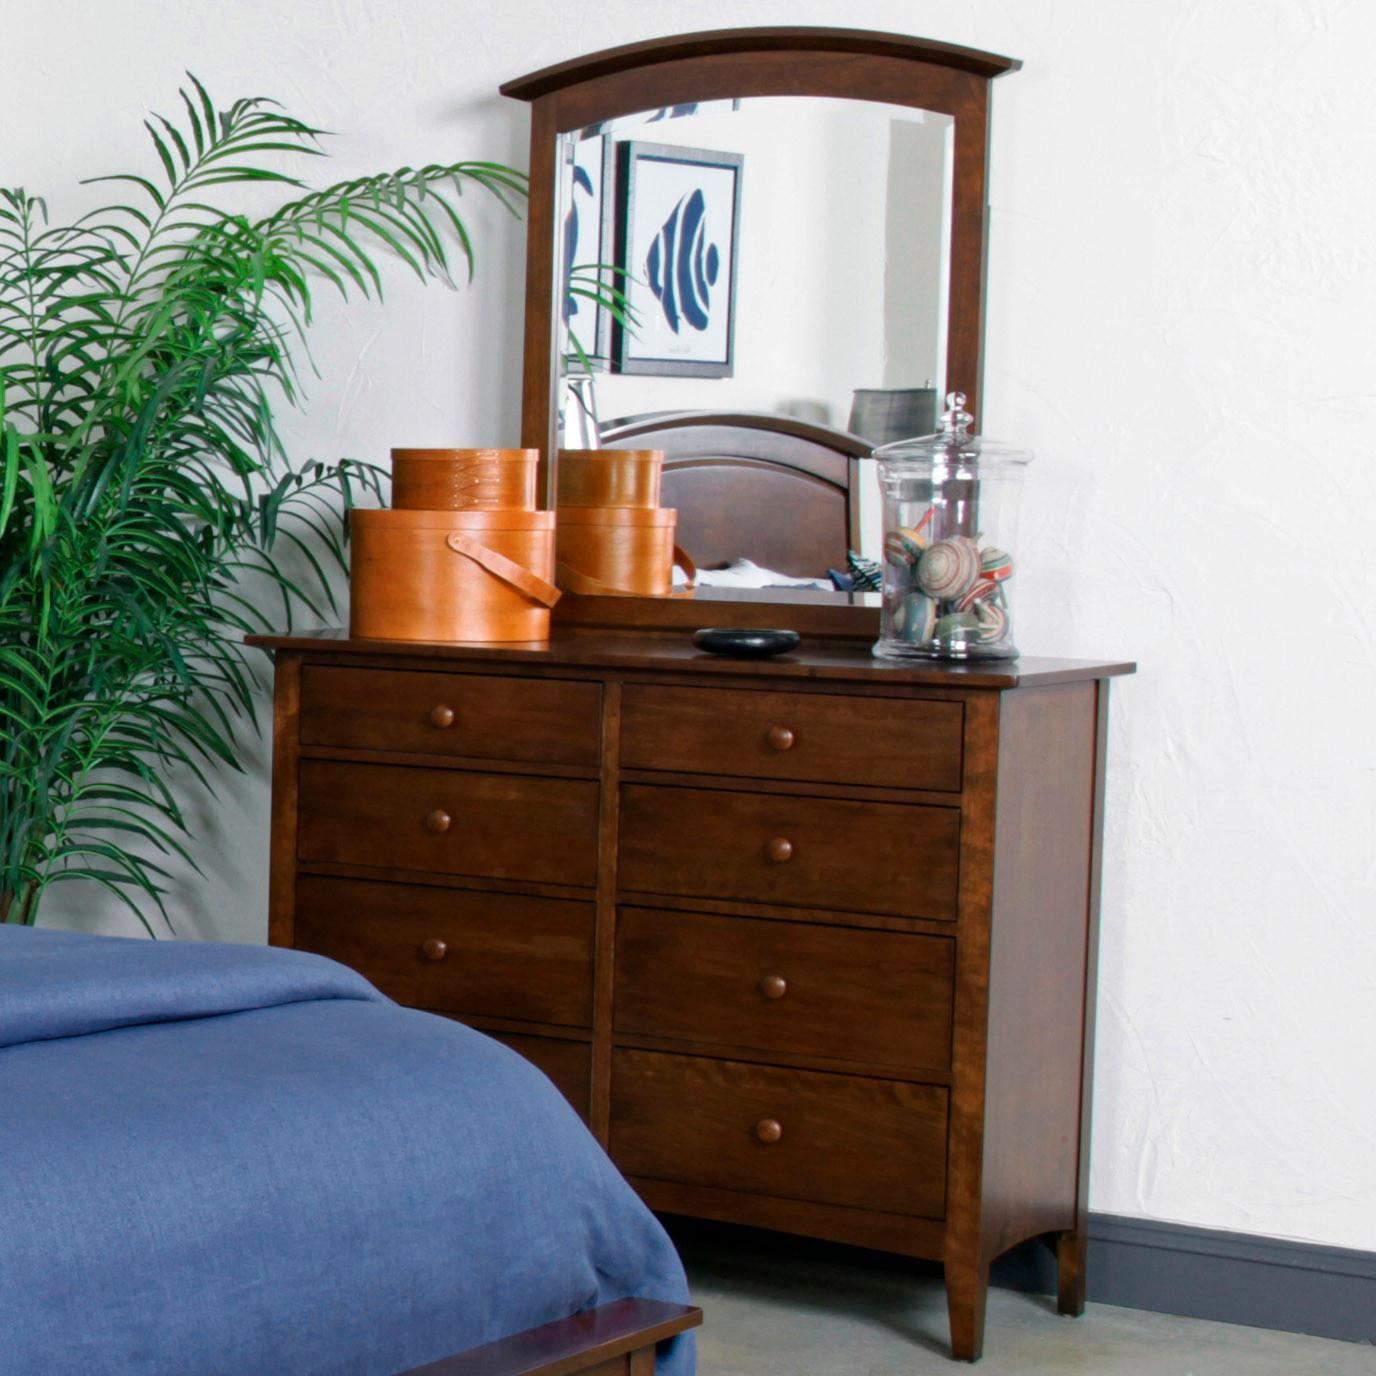 Kincaid Furniture Gatherings Dresser and Mirror - Item Number: 44-1031+44-1830